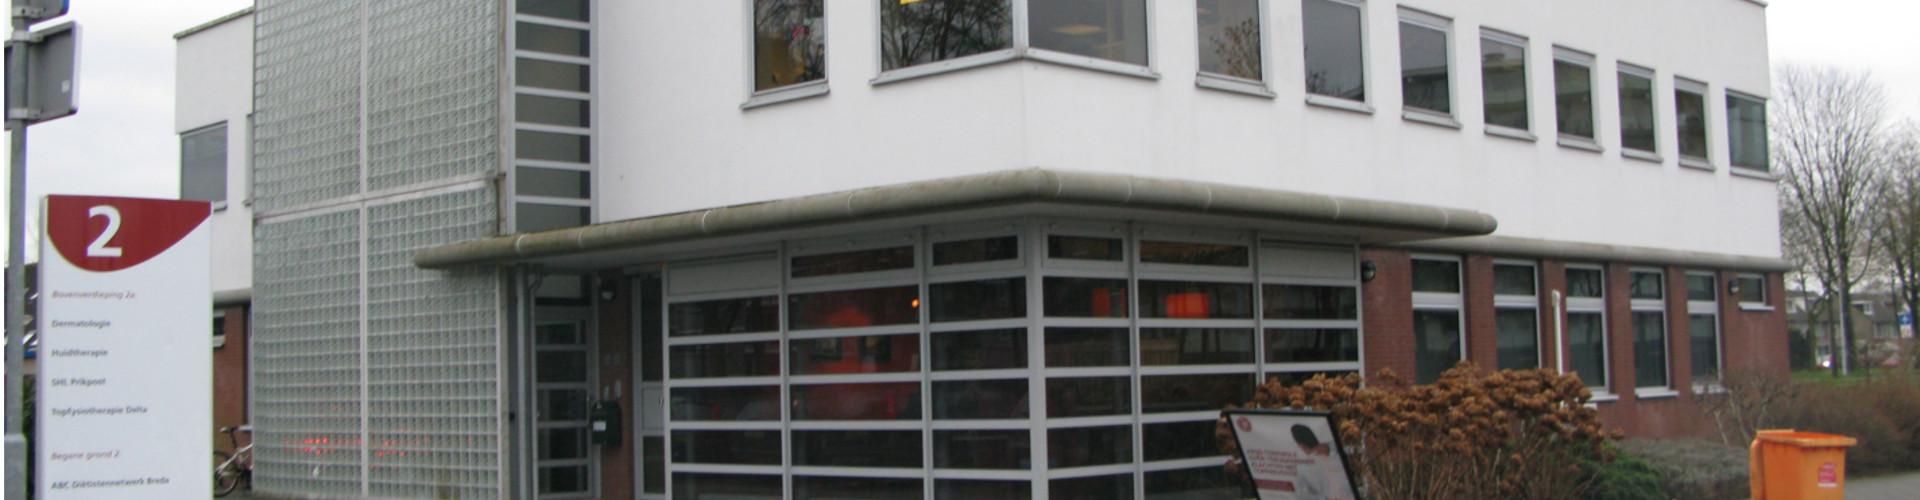 zomergemstraat-breda